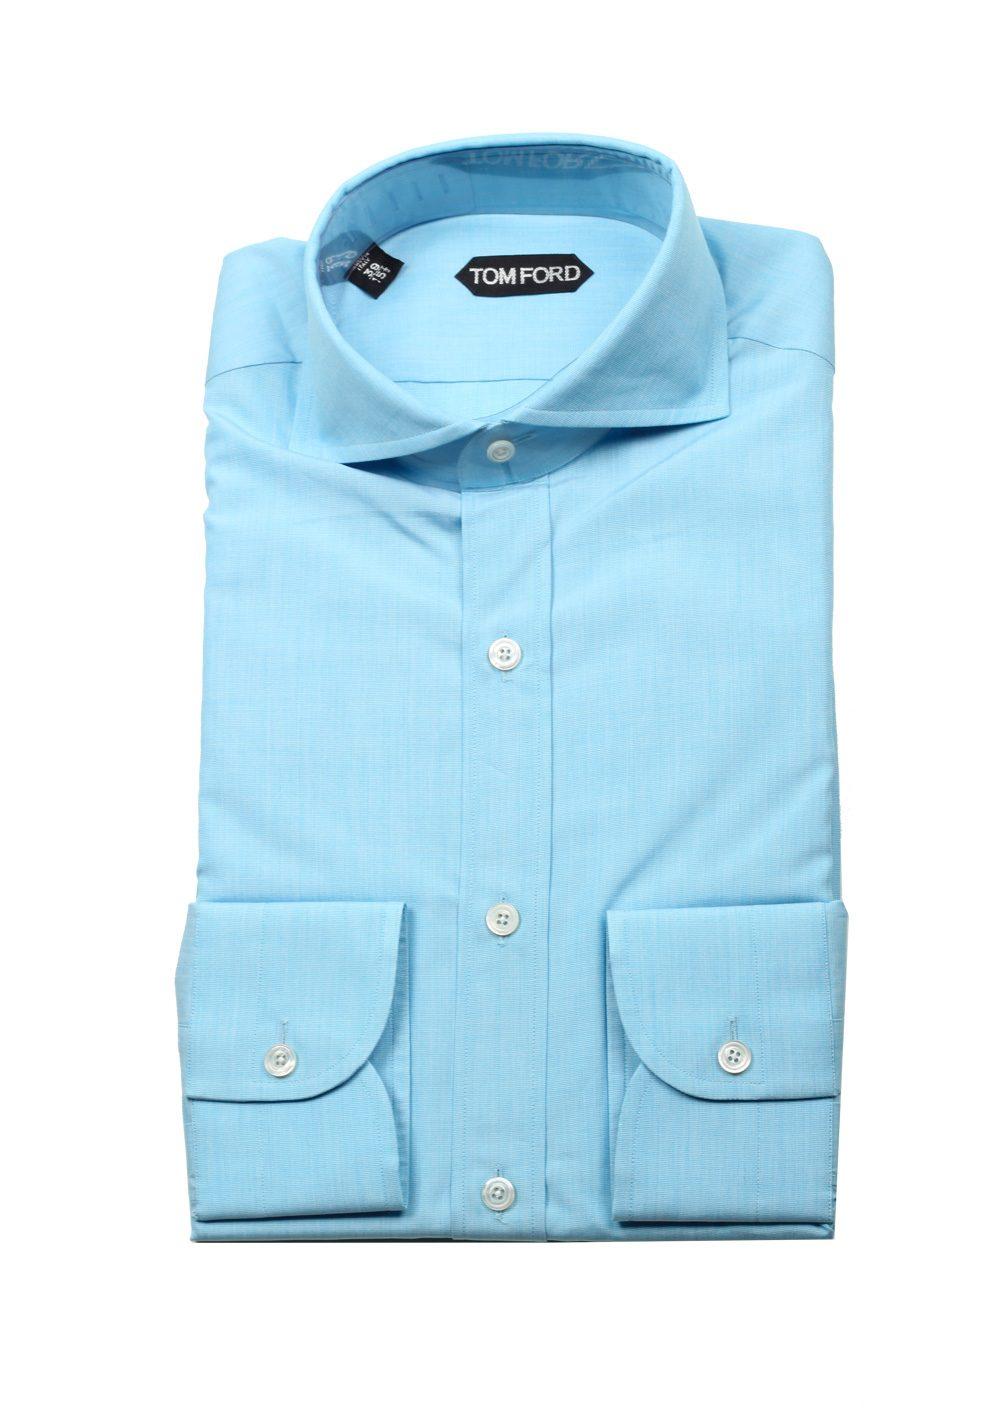 060bd02fb83 TOM FORD Solid Blue Dress Shirt Size 39   15